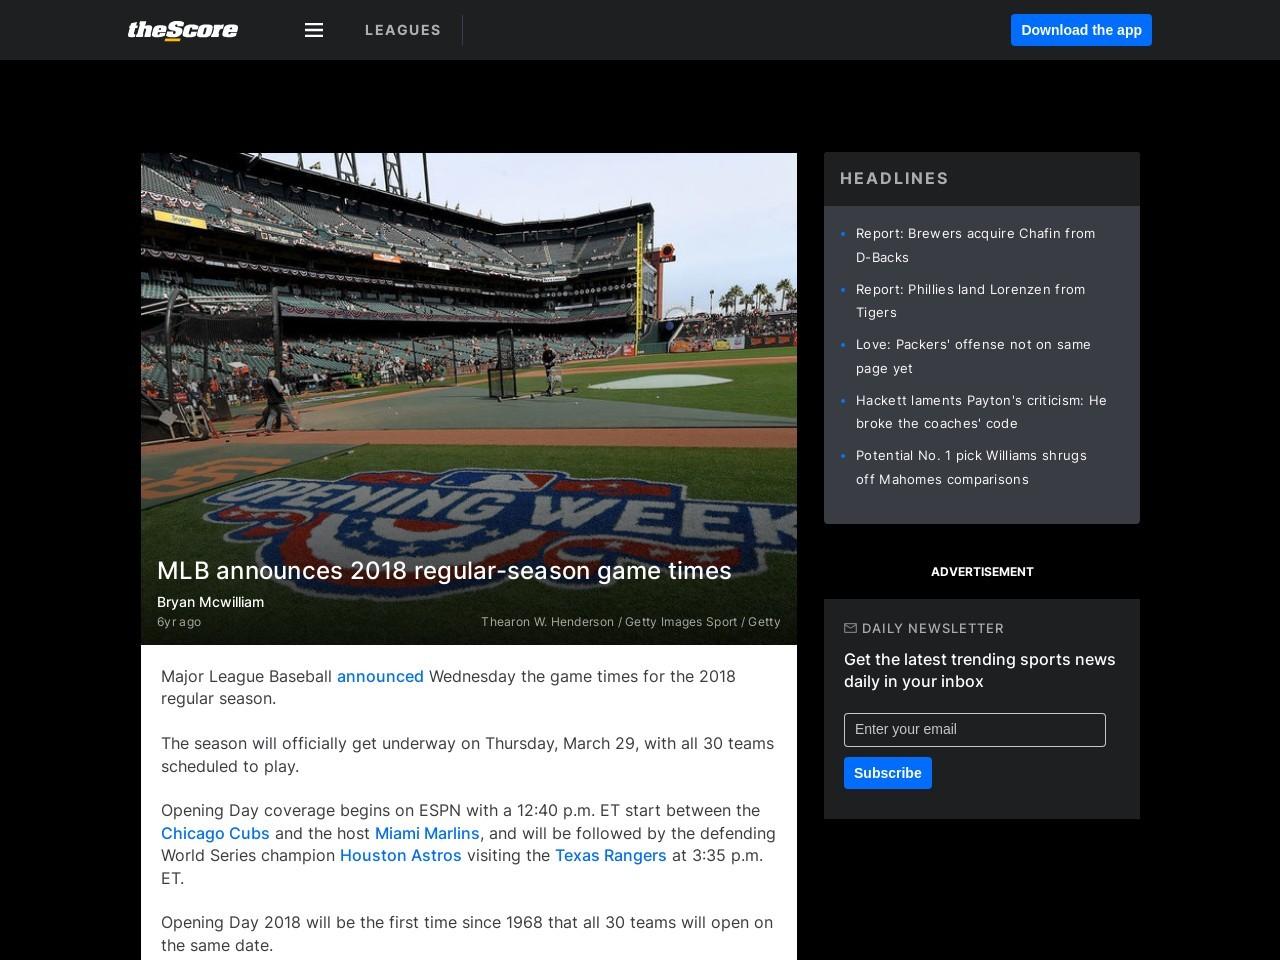 MLB announces 2018 regular-season game times